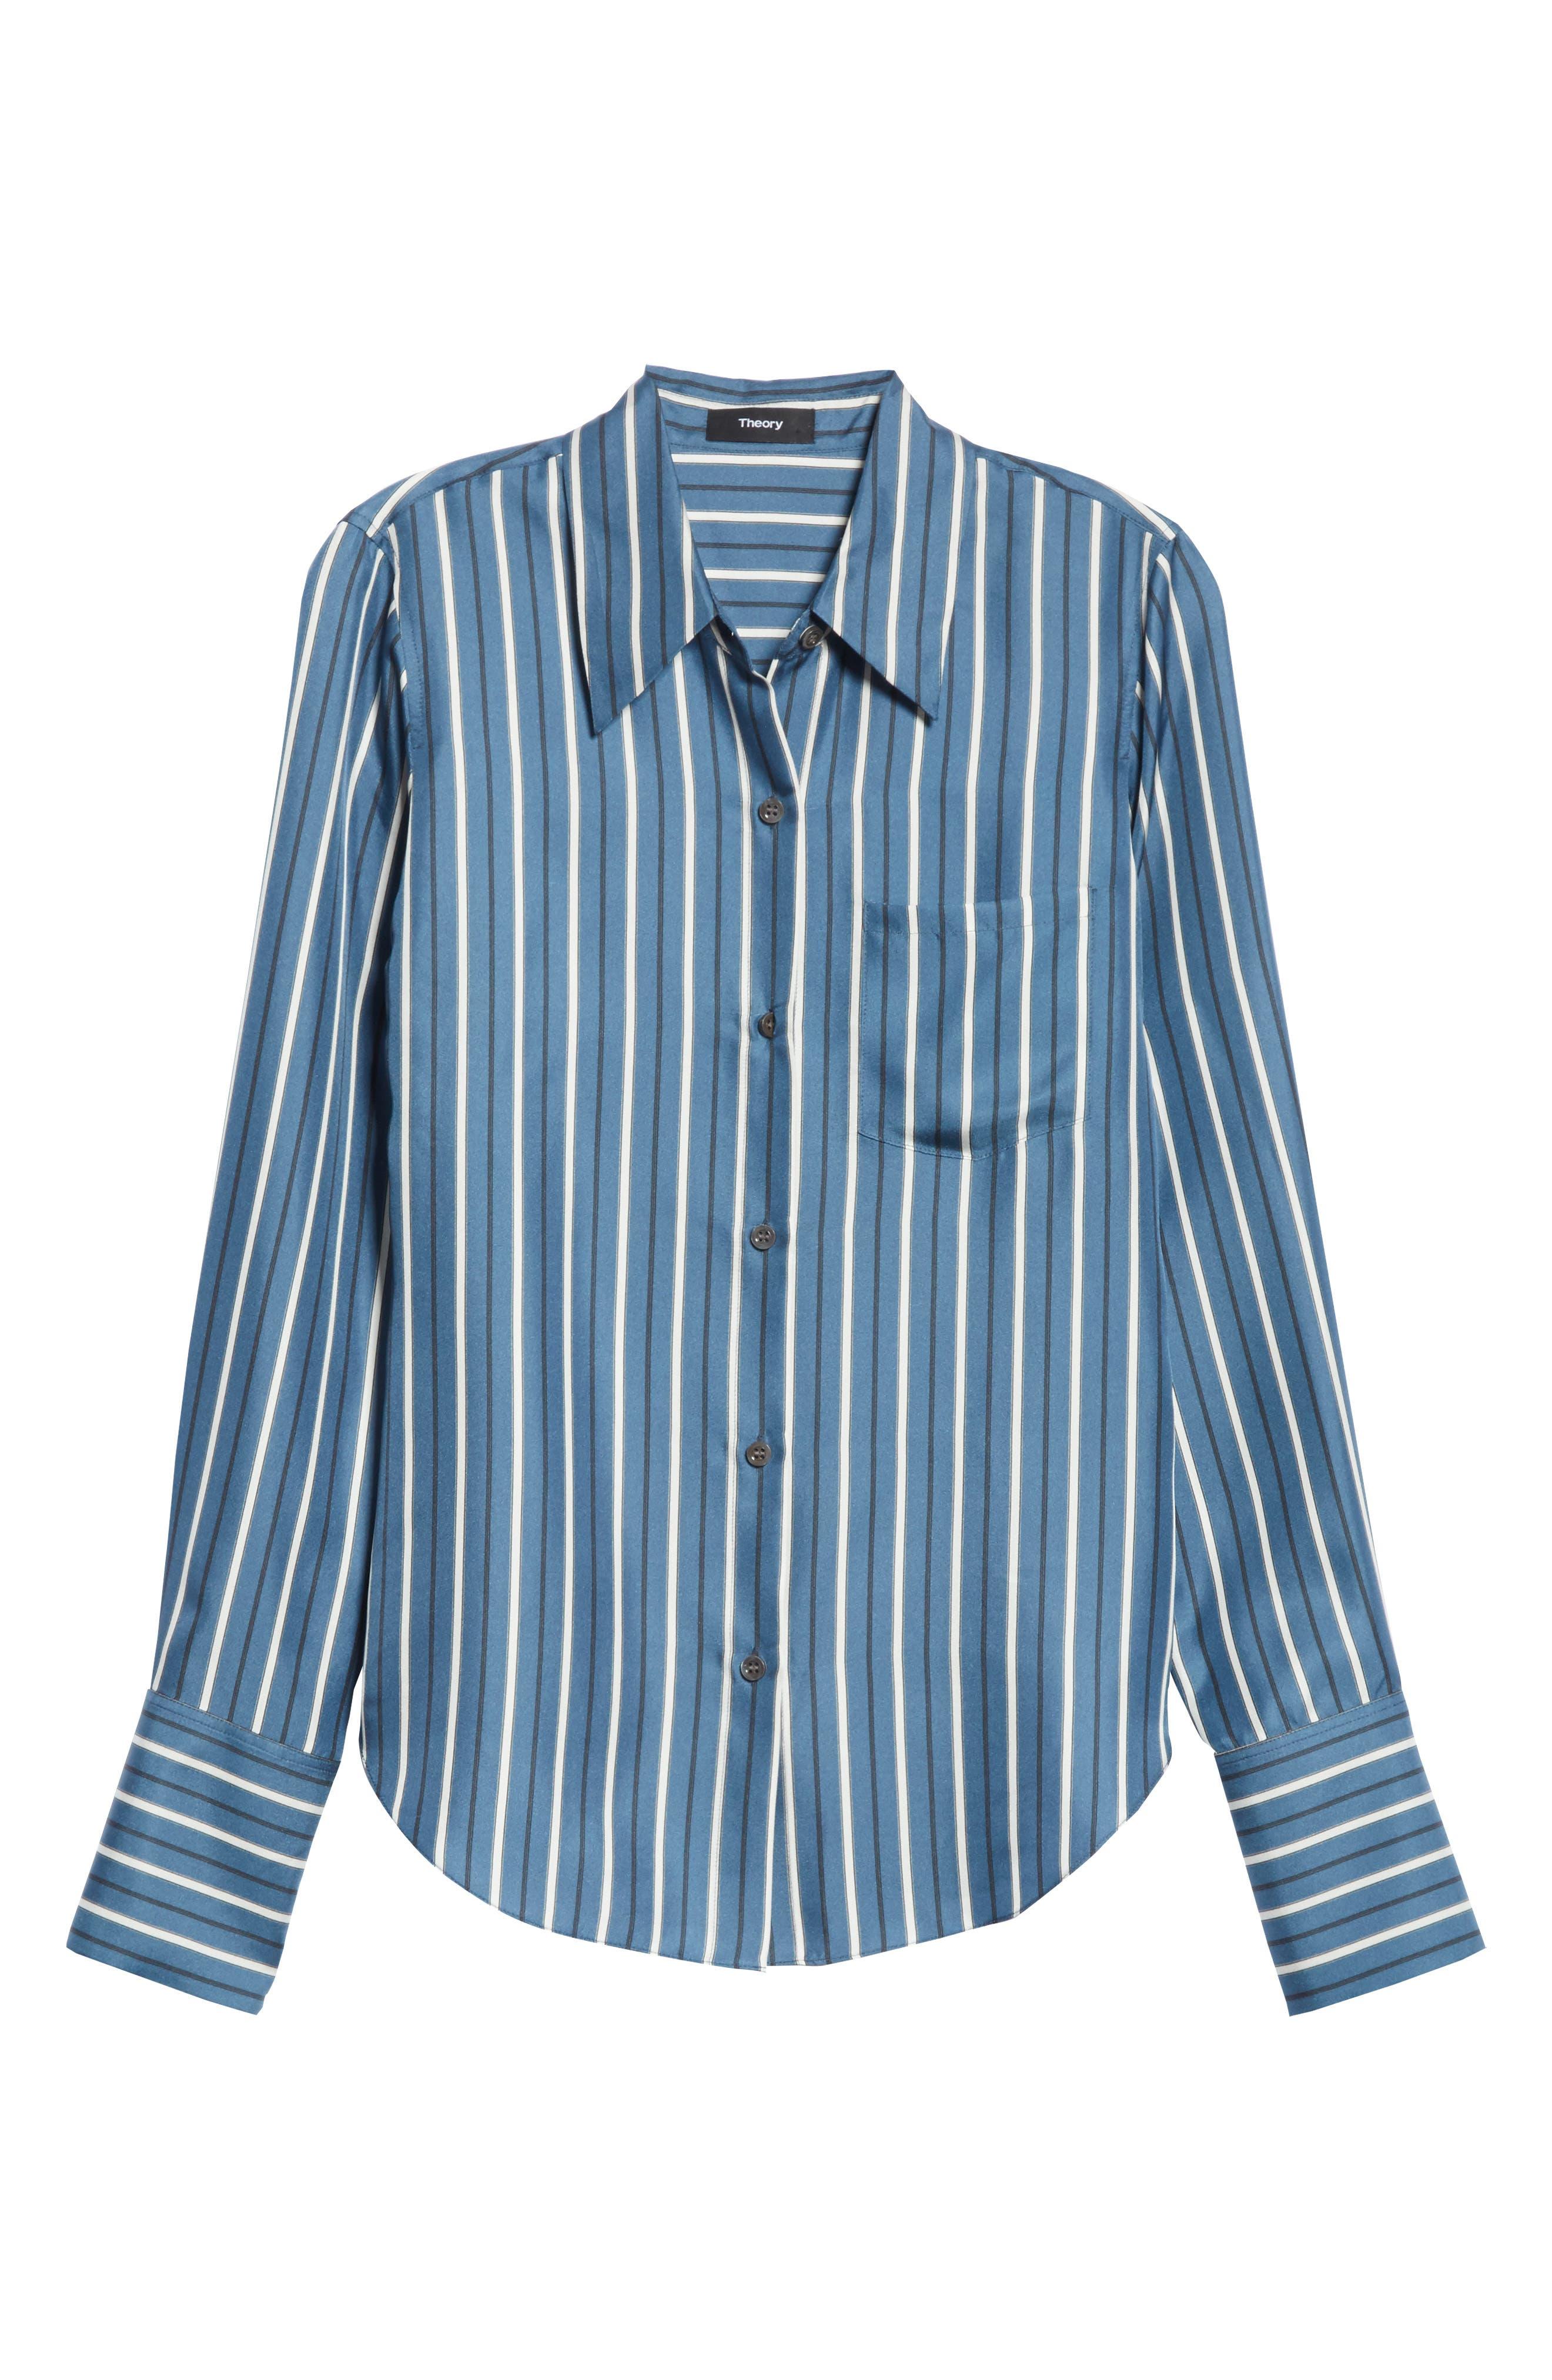 Darby Silk Button Shirt,                             Alternate thumbnail 6, color,                             491